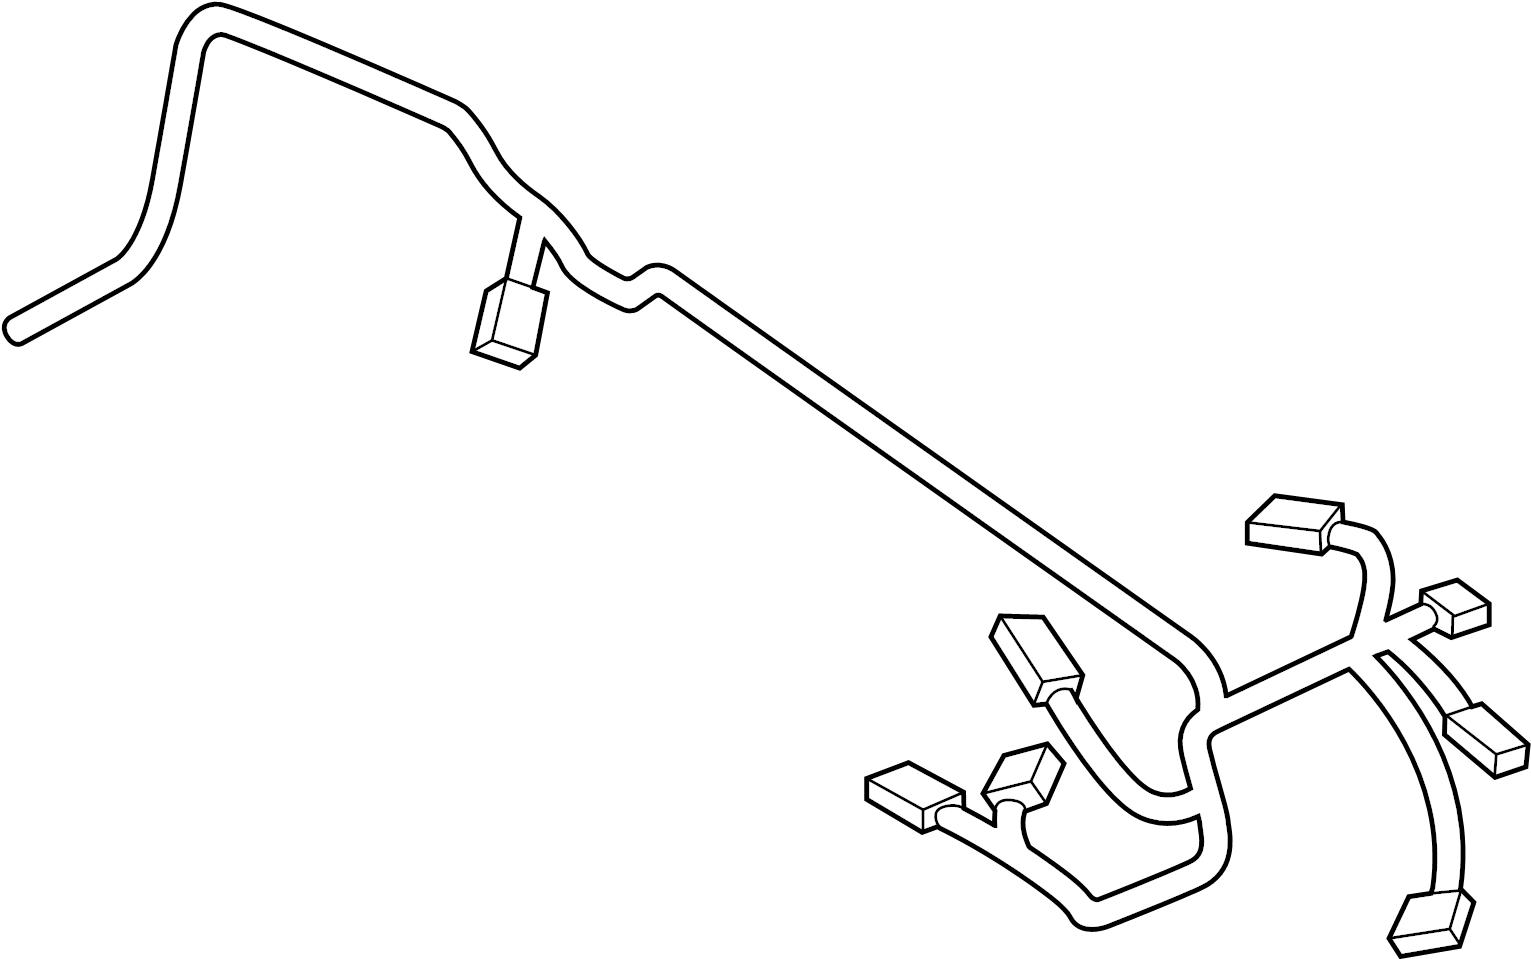 2015 bmw 428i wiring harness  engine grbx  module  system  electrical